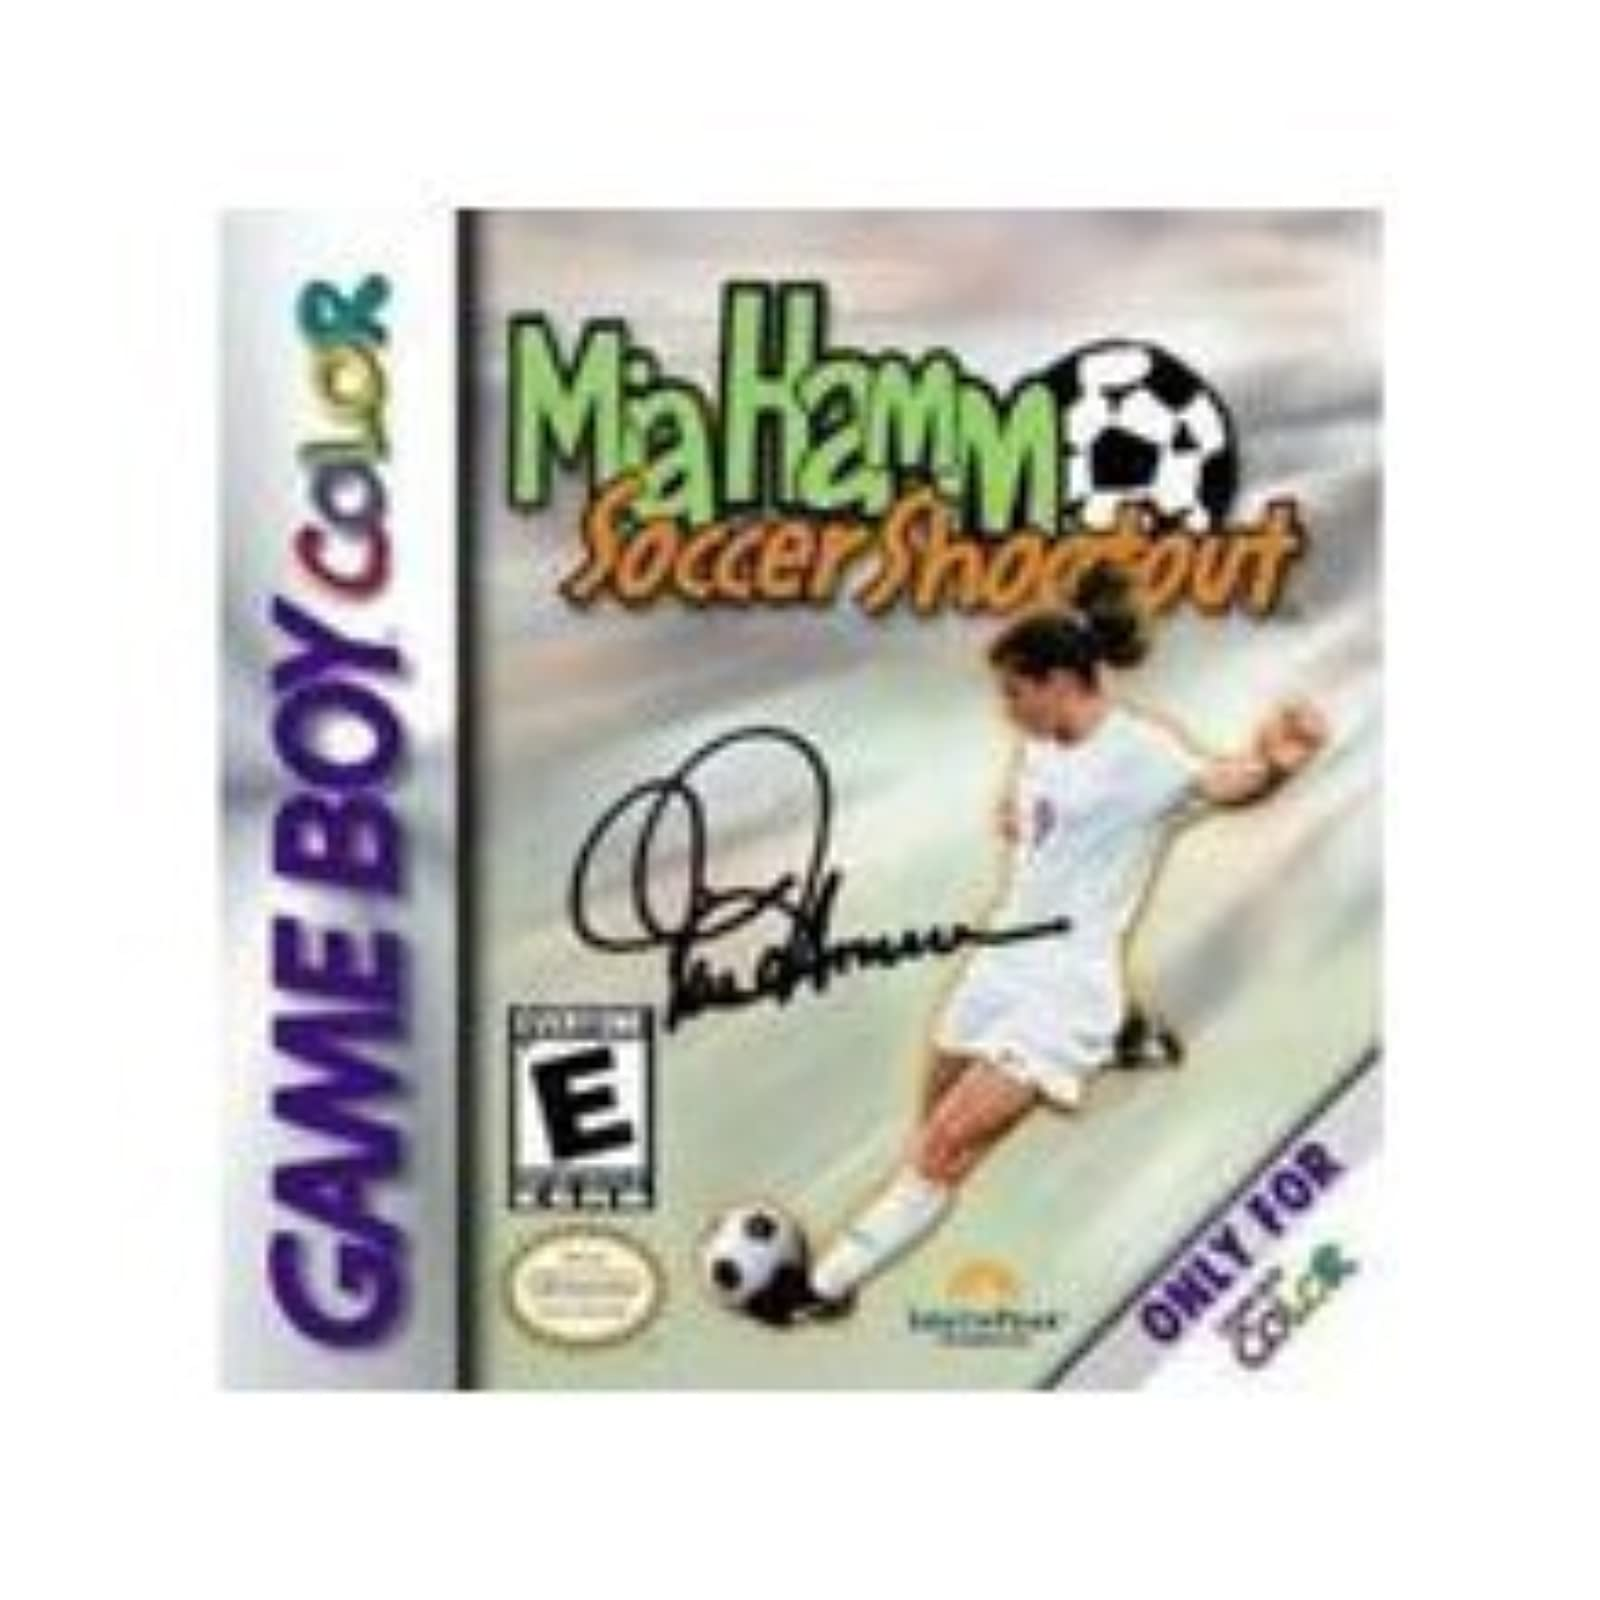 Mia Hamm Soccer Shootout On Gameboy